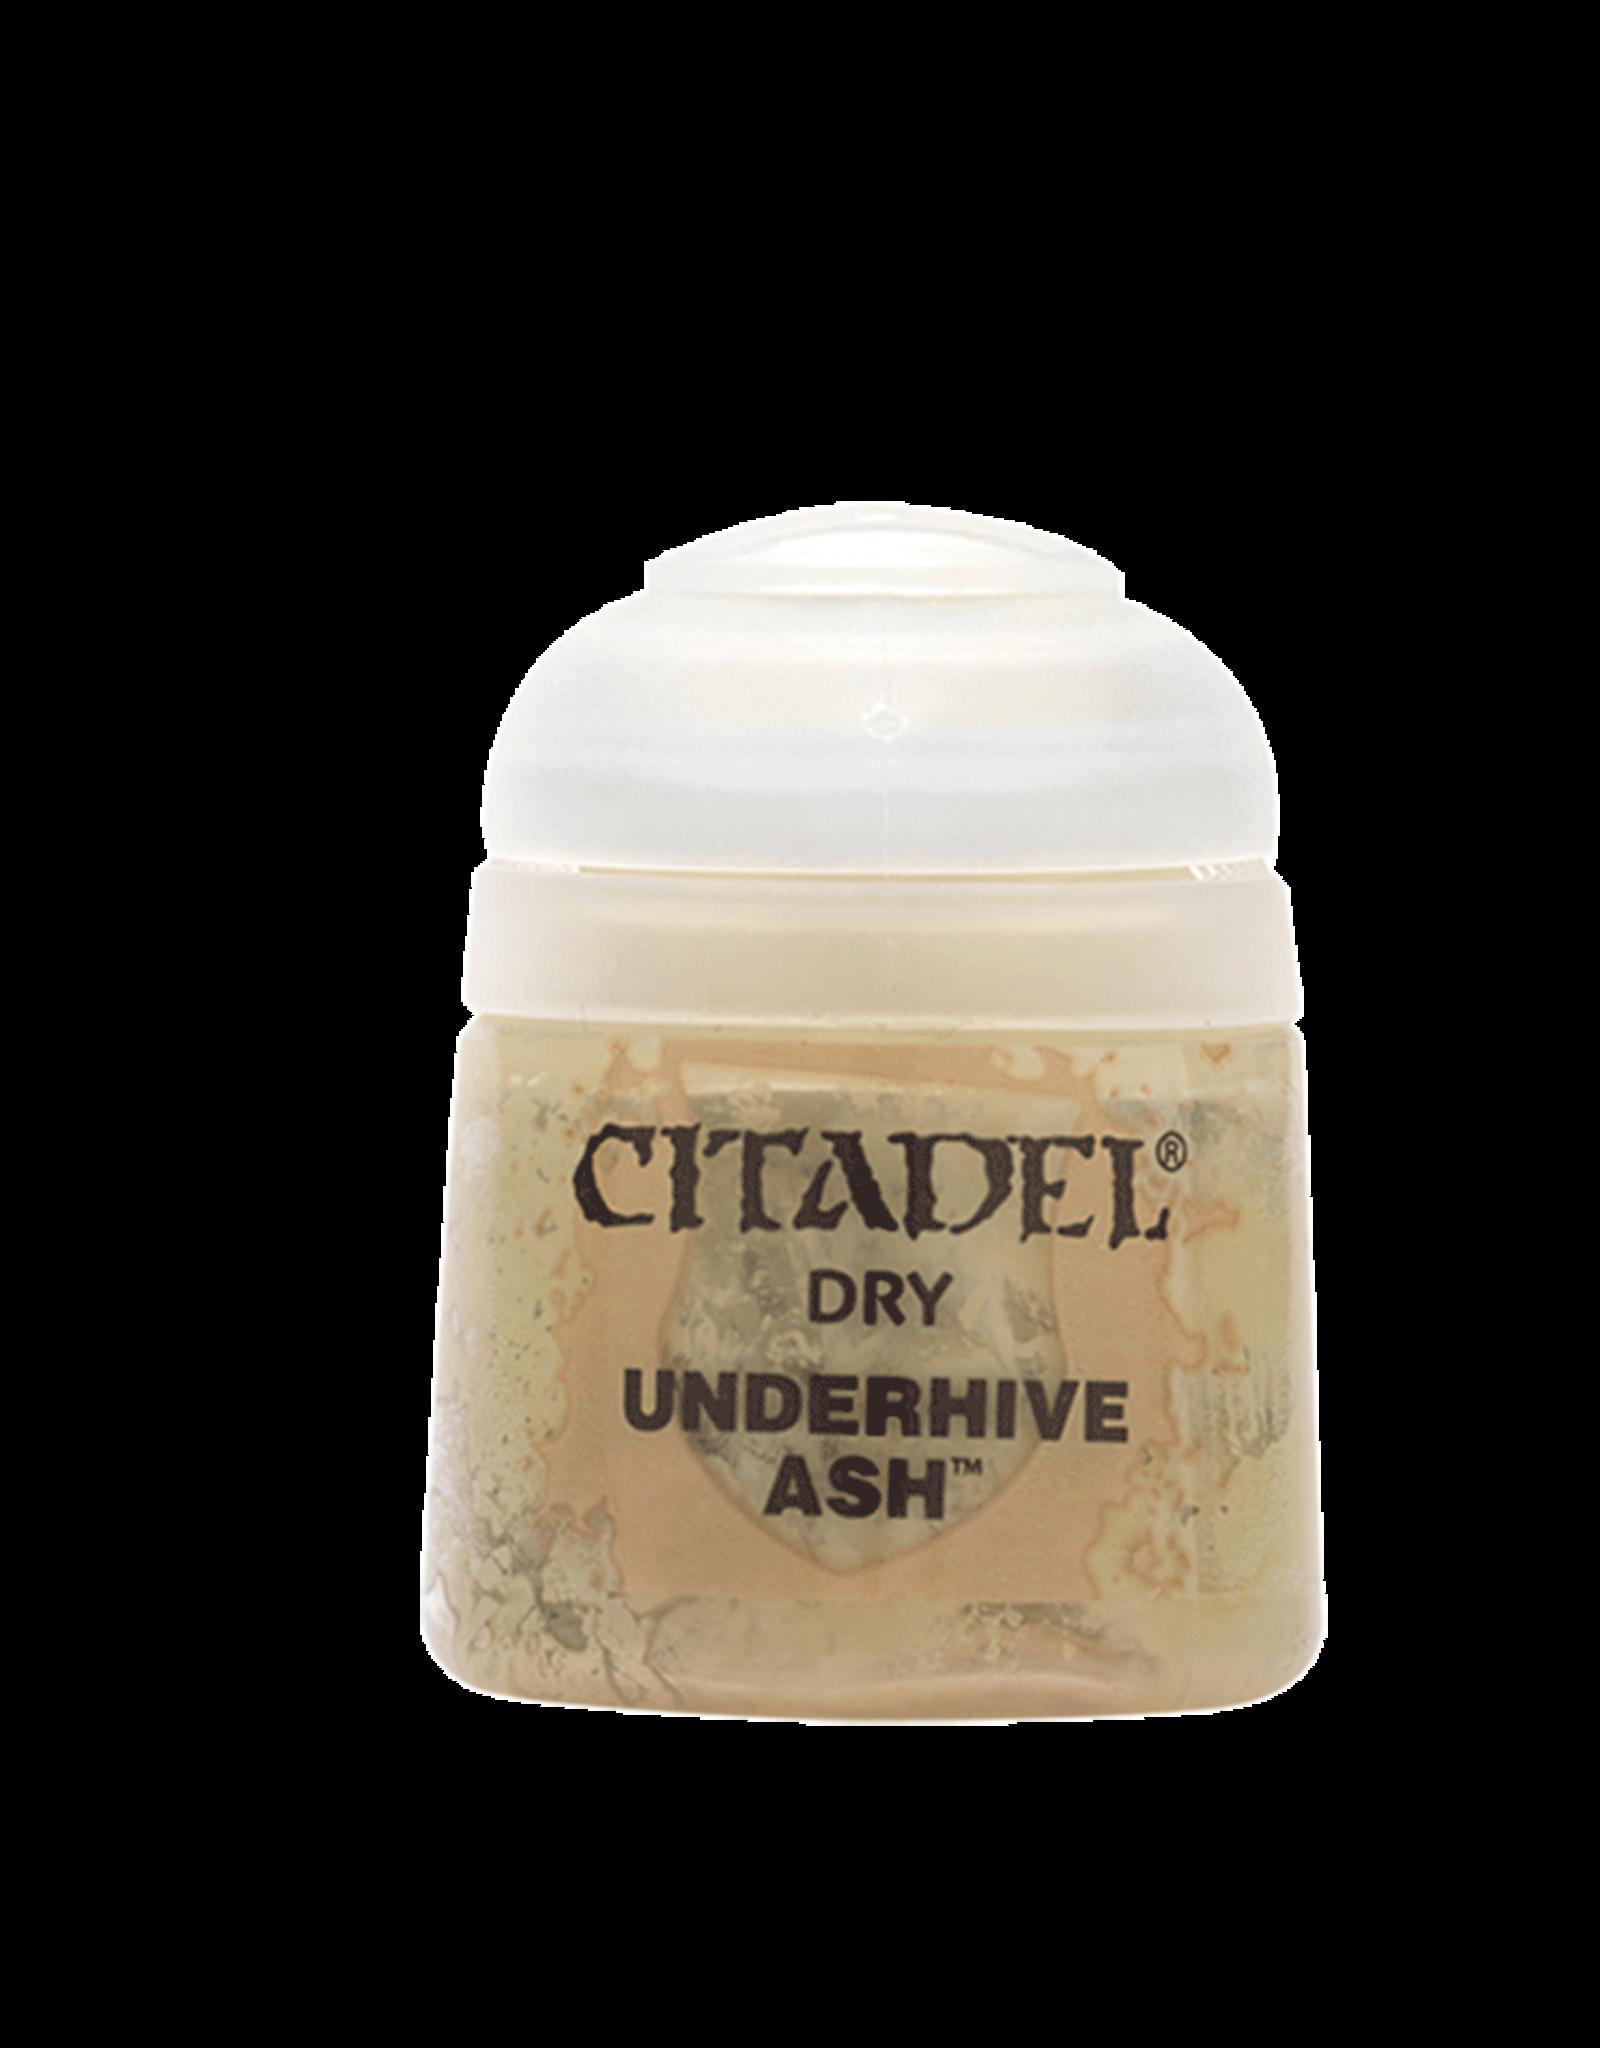 Citadel Citadel Dry: Underhive Ash (12ml)